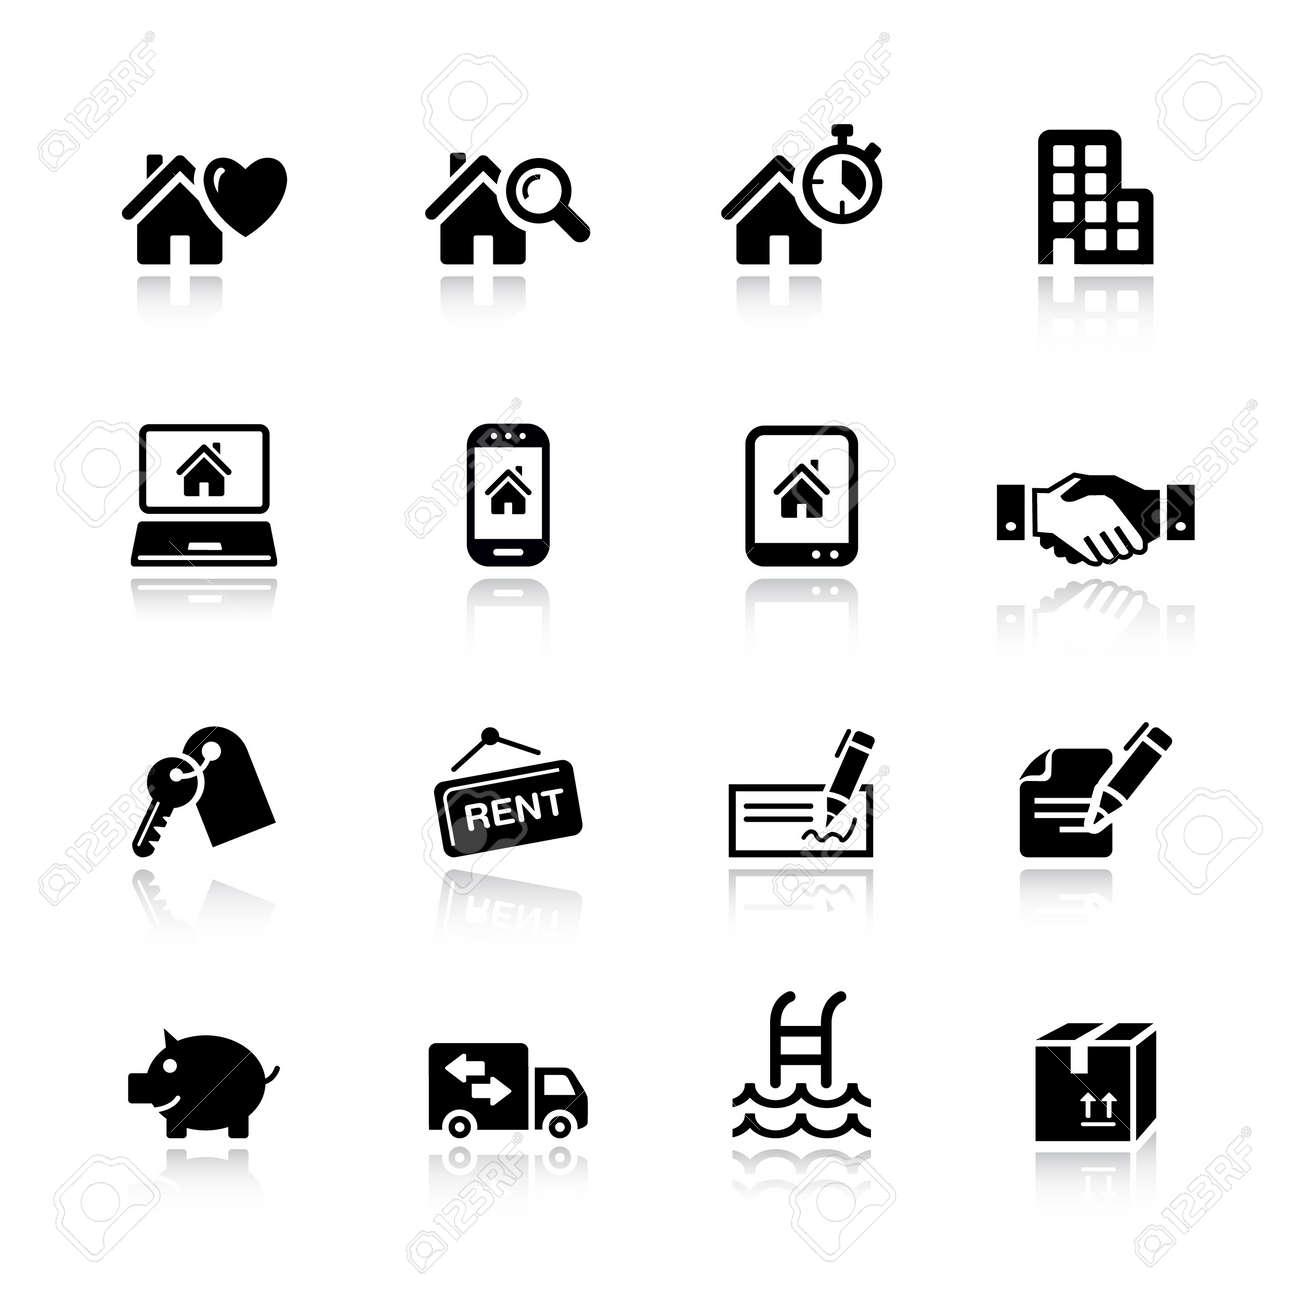 Basic - Real estate icons - 11475999